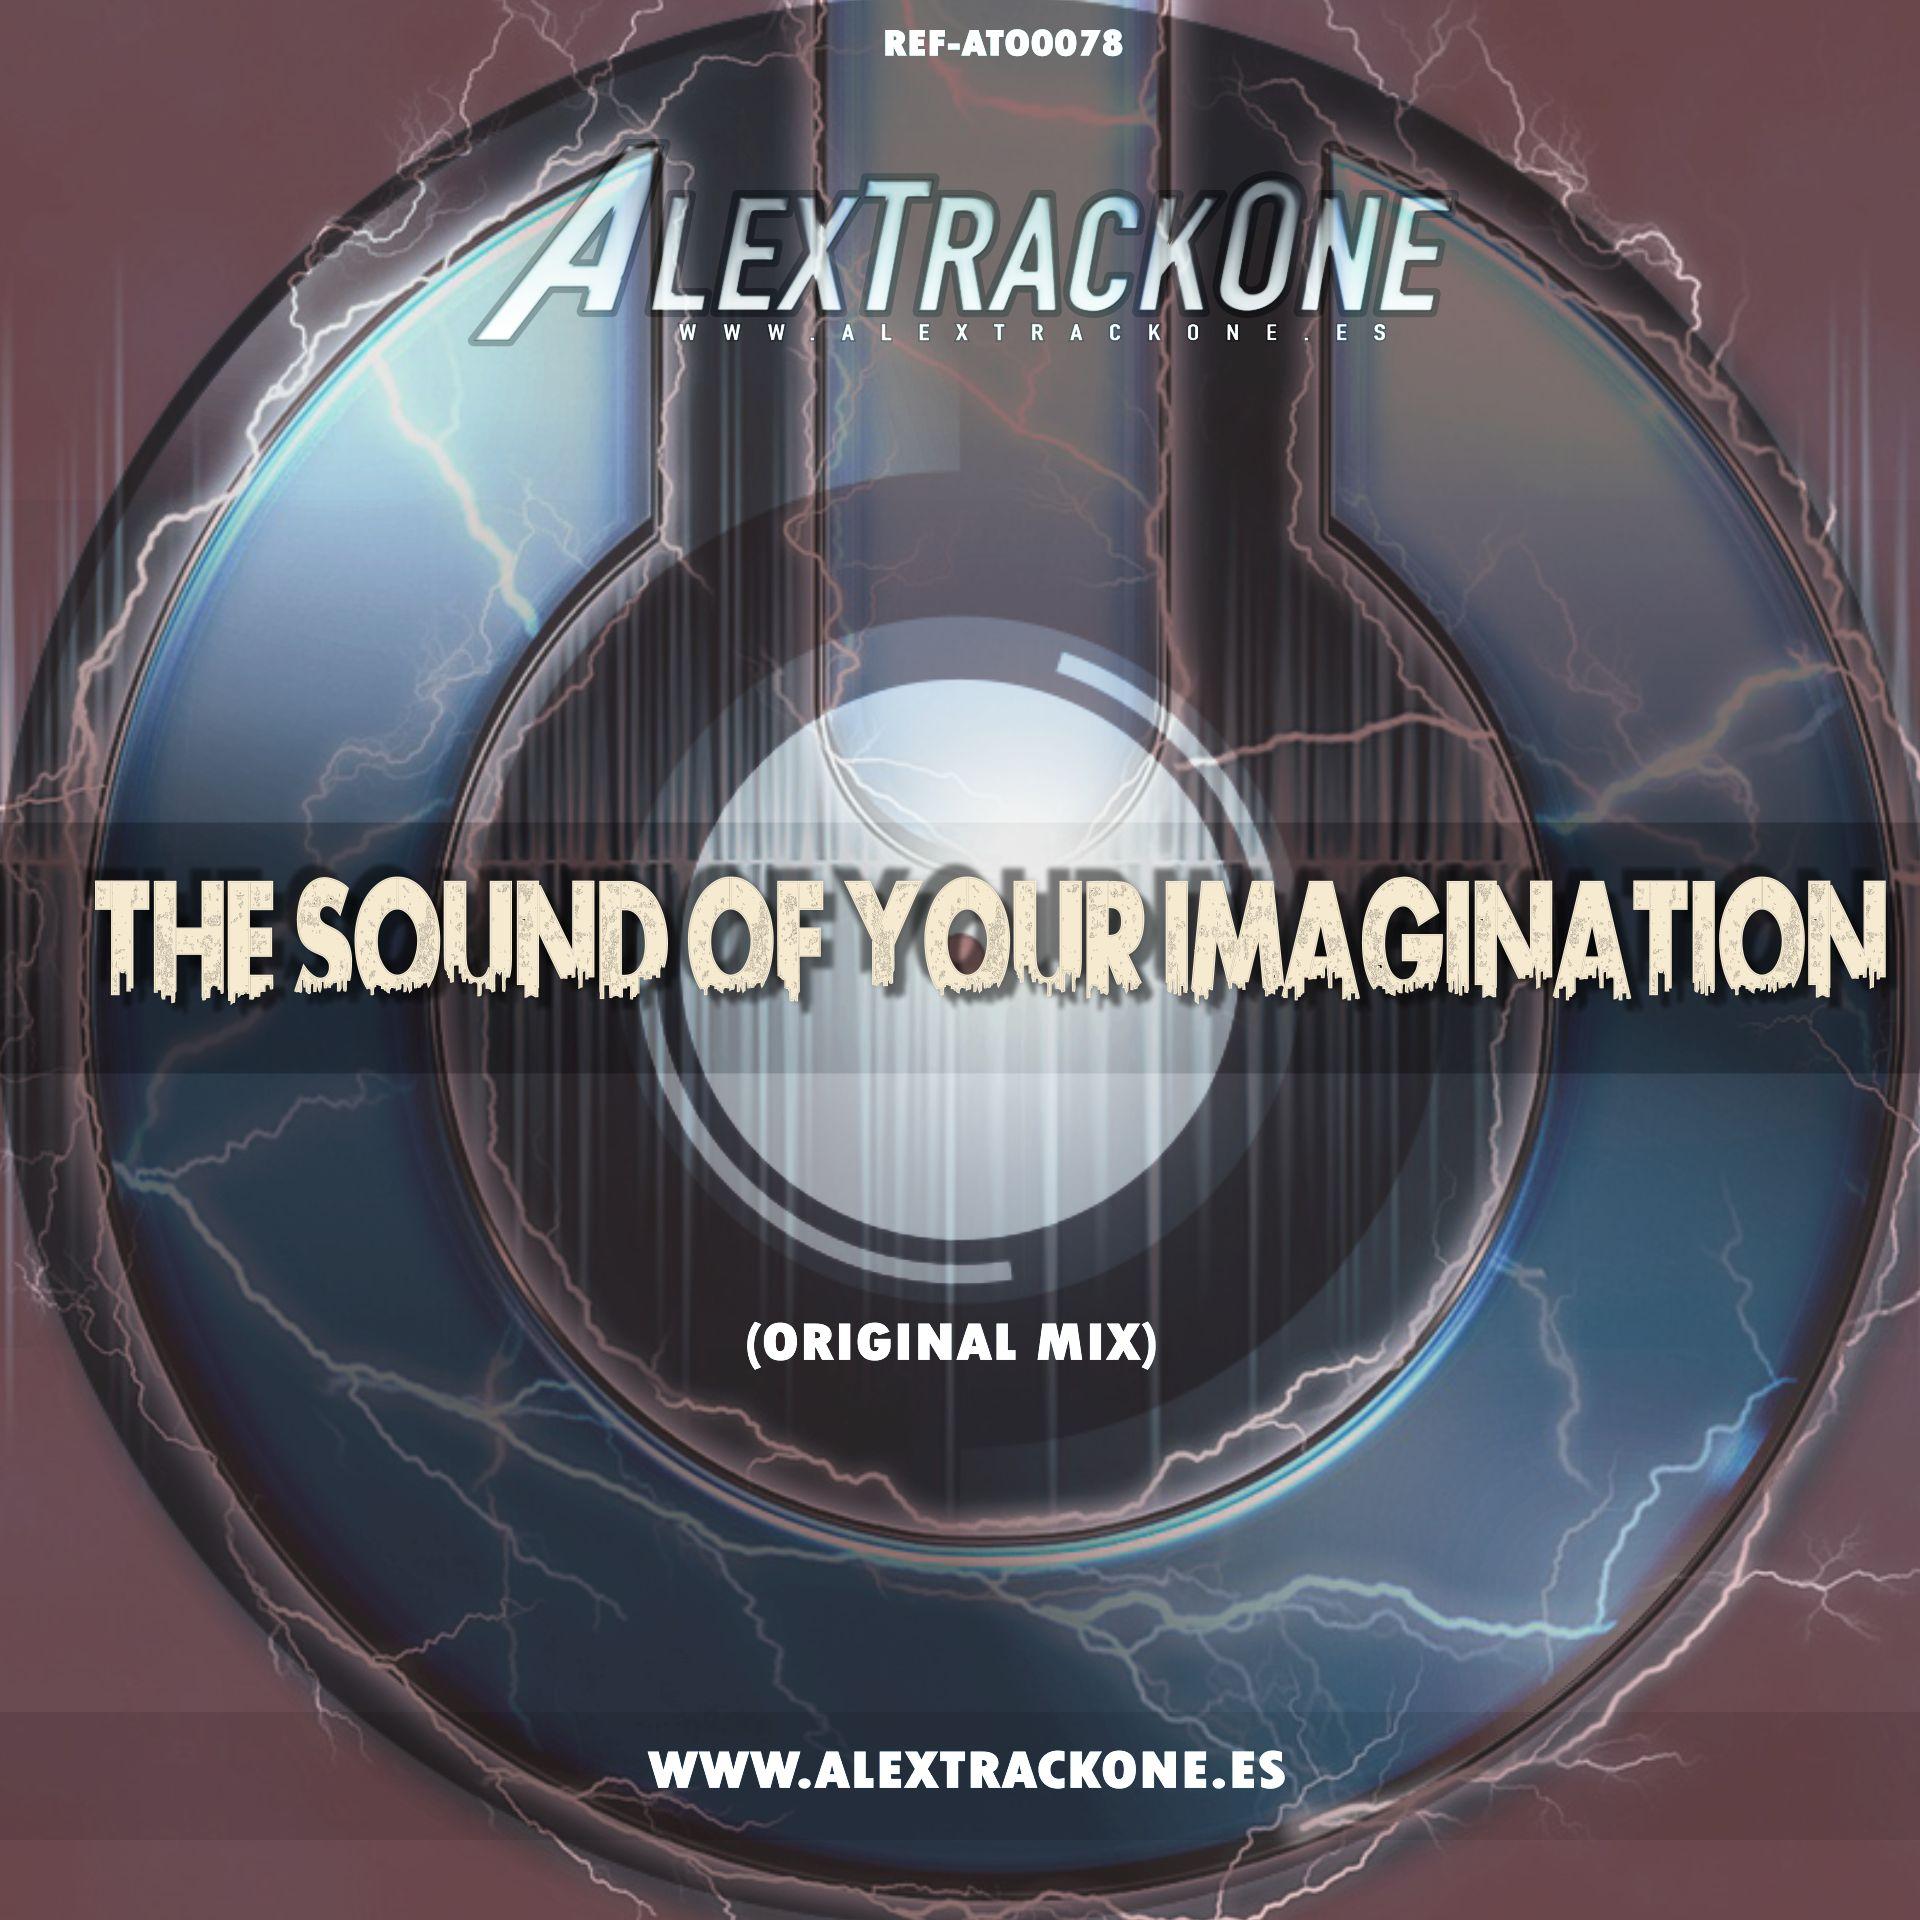 REF-ATO0078 THE SOUND OF YOUR IMAGINATION (ORIGINAL MIX) (MP3 & WAV & FLAC)